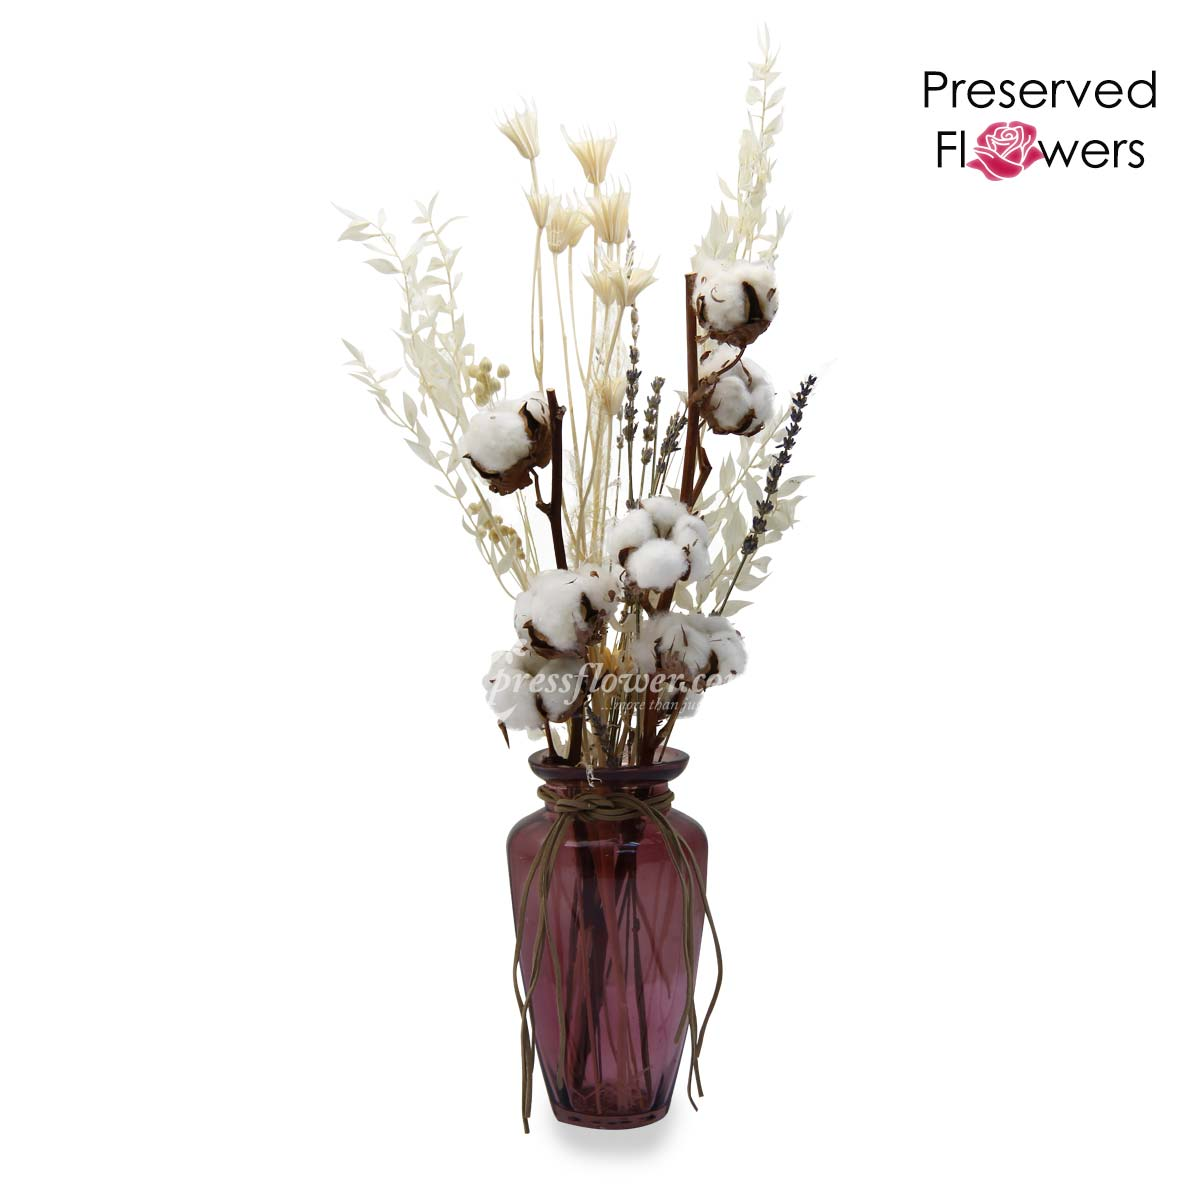 Perfectly Splendid (Dried Flowers)